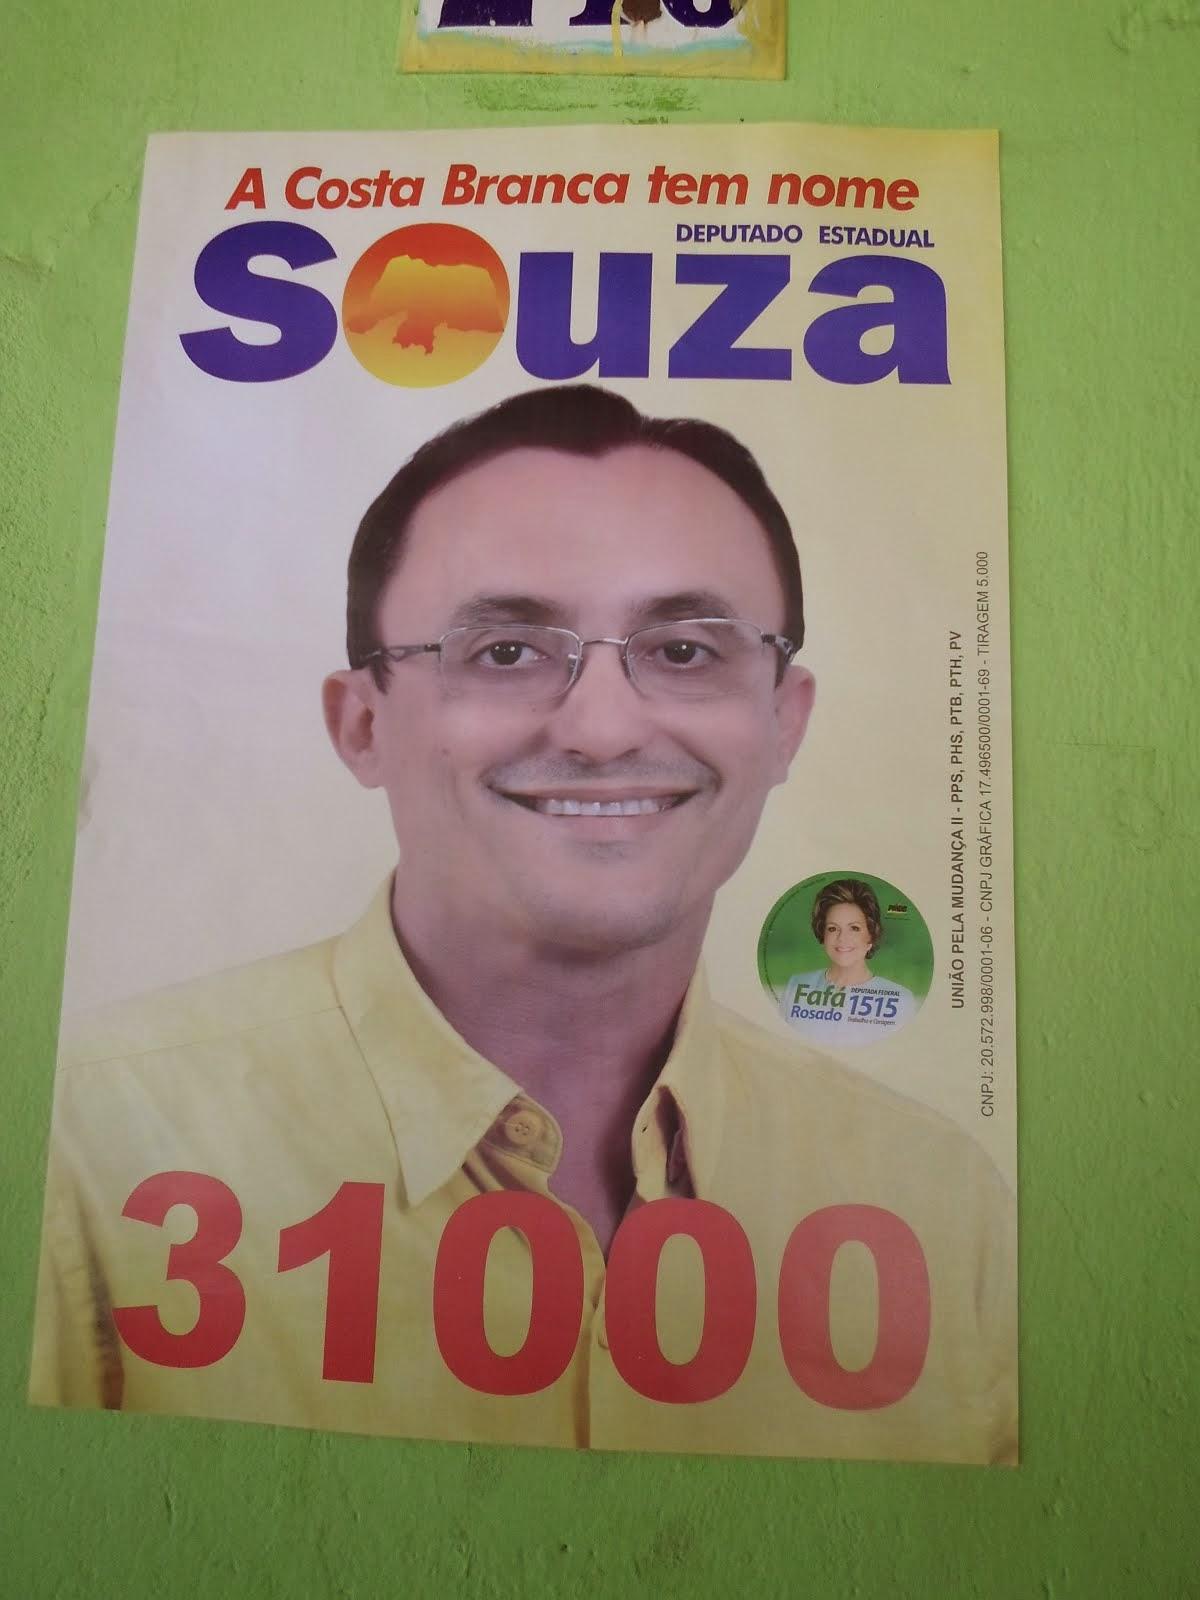 A COSTA BRANCA TEM NOME SOUZA  DEPUTADO ESTADUAL  Nº31.000